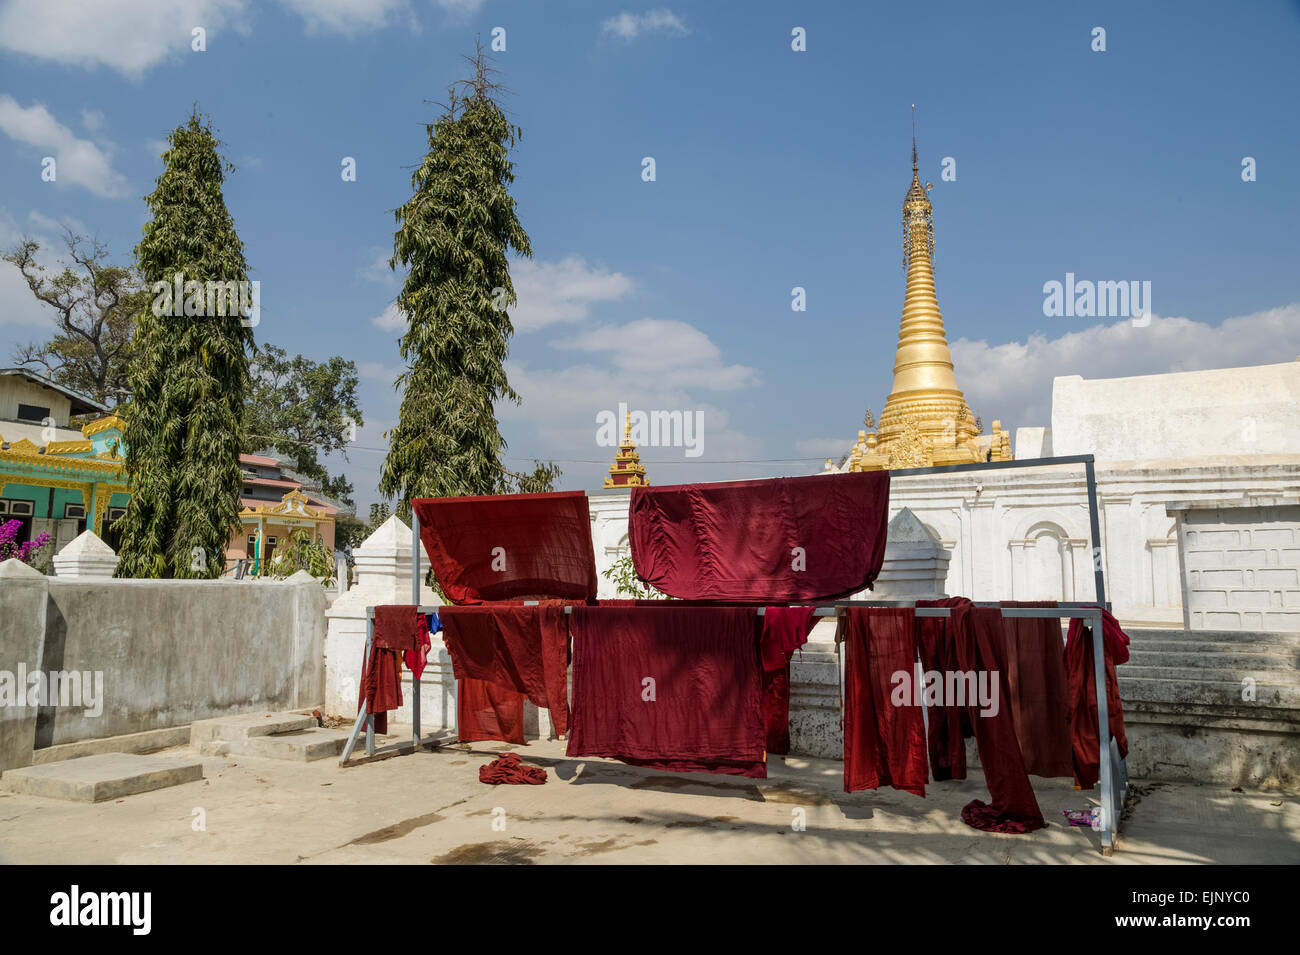 Nyuang Shwe Monastery - Stock Image